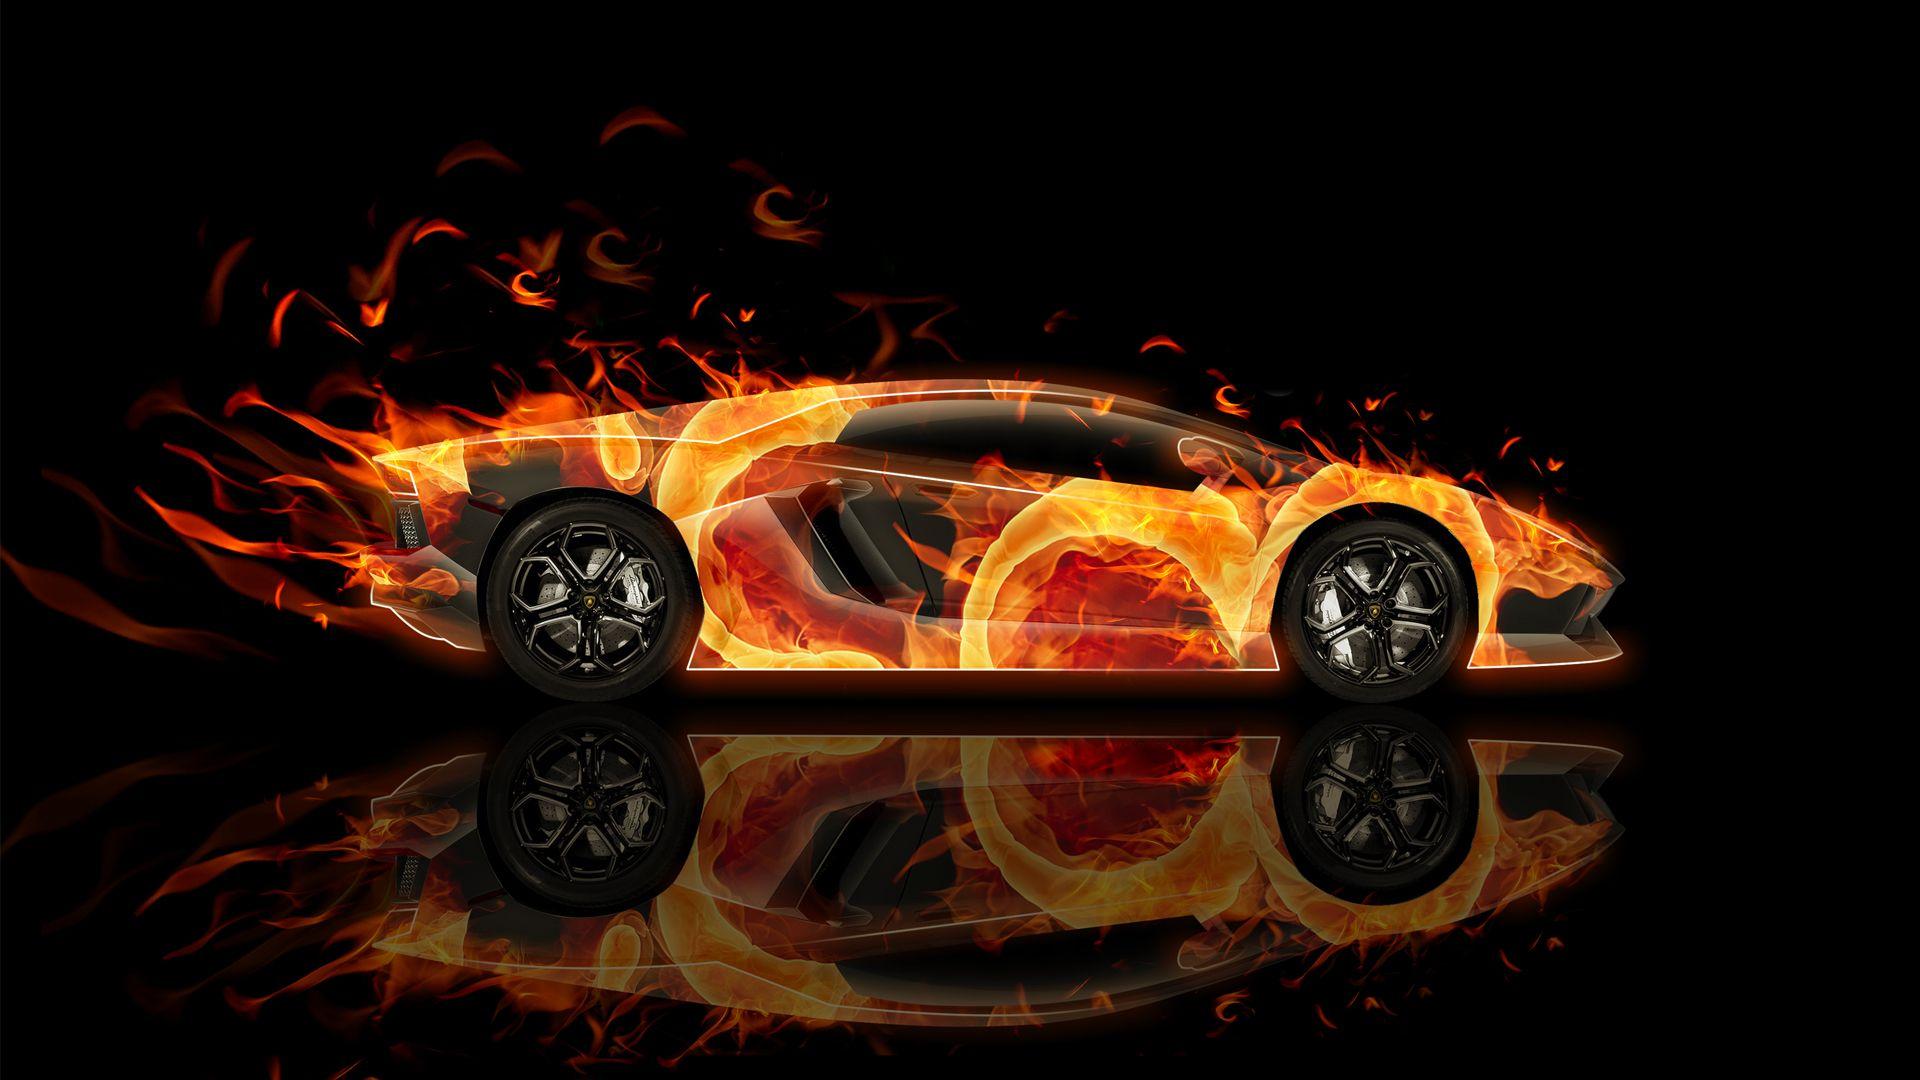 Superieur Find Out Lamborghini Aventador Rear Wallpaper On